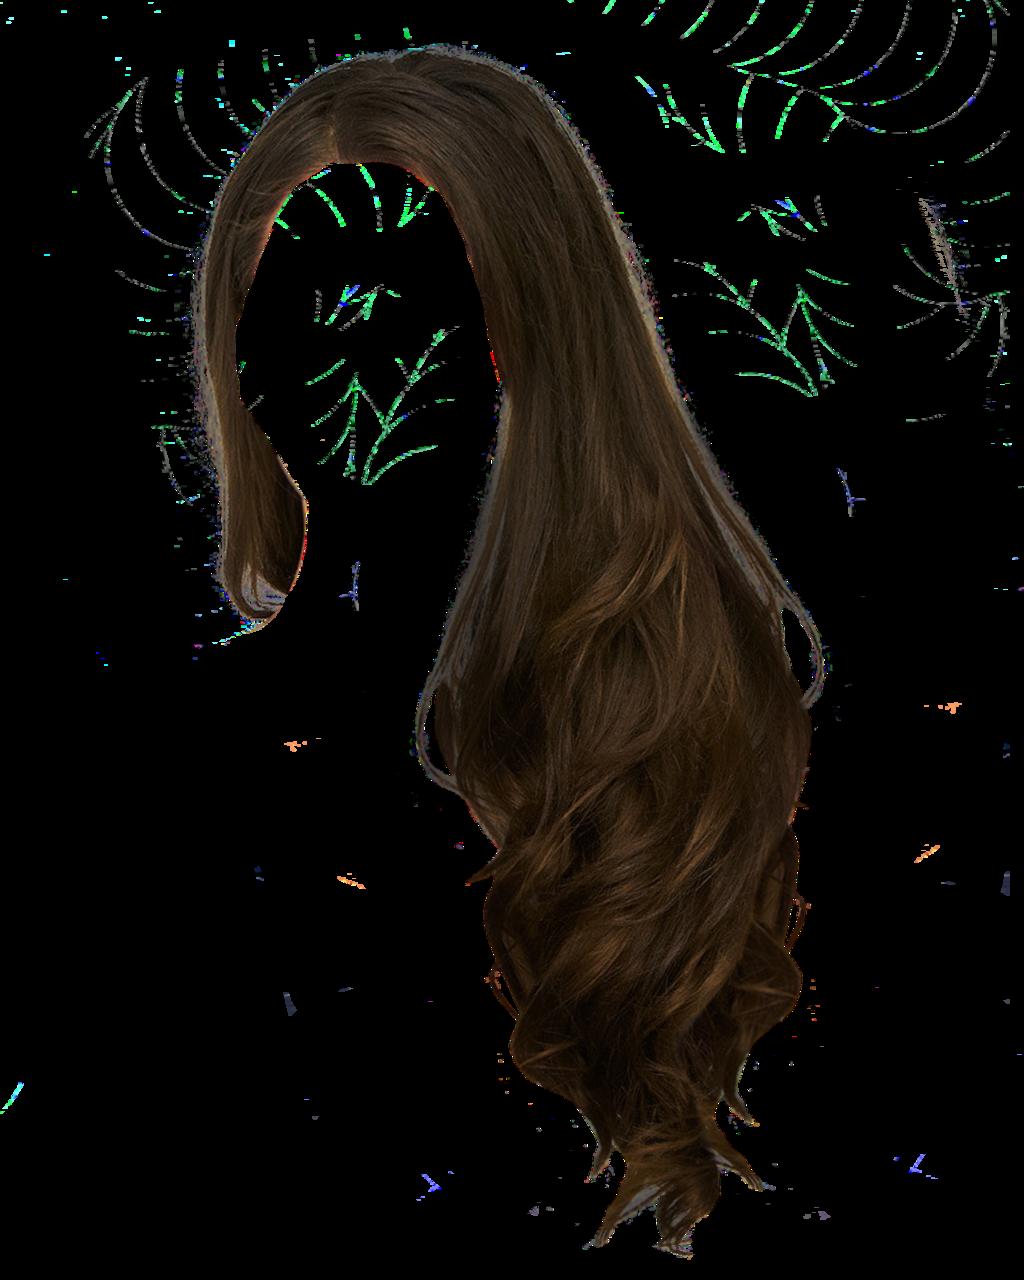 Girl hair png #26035.